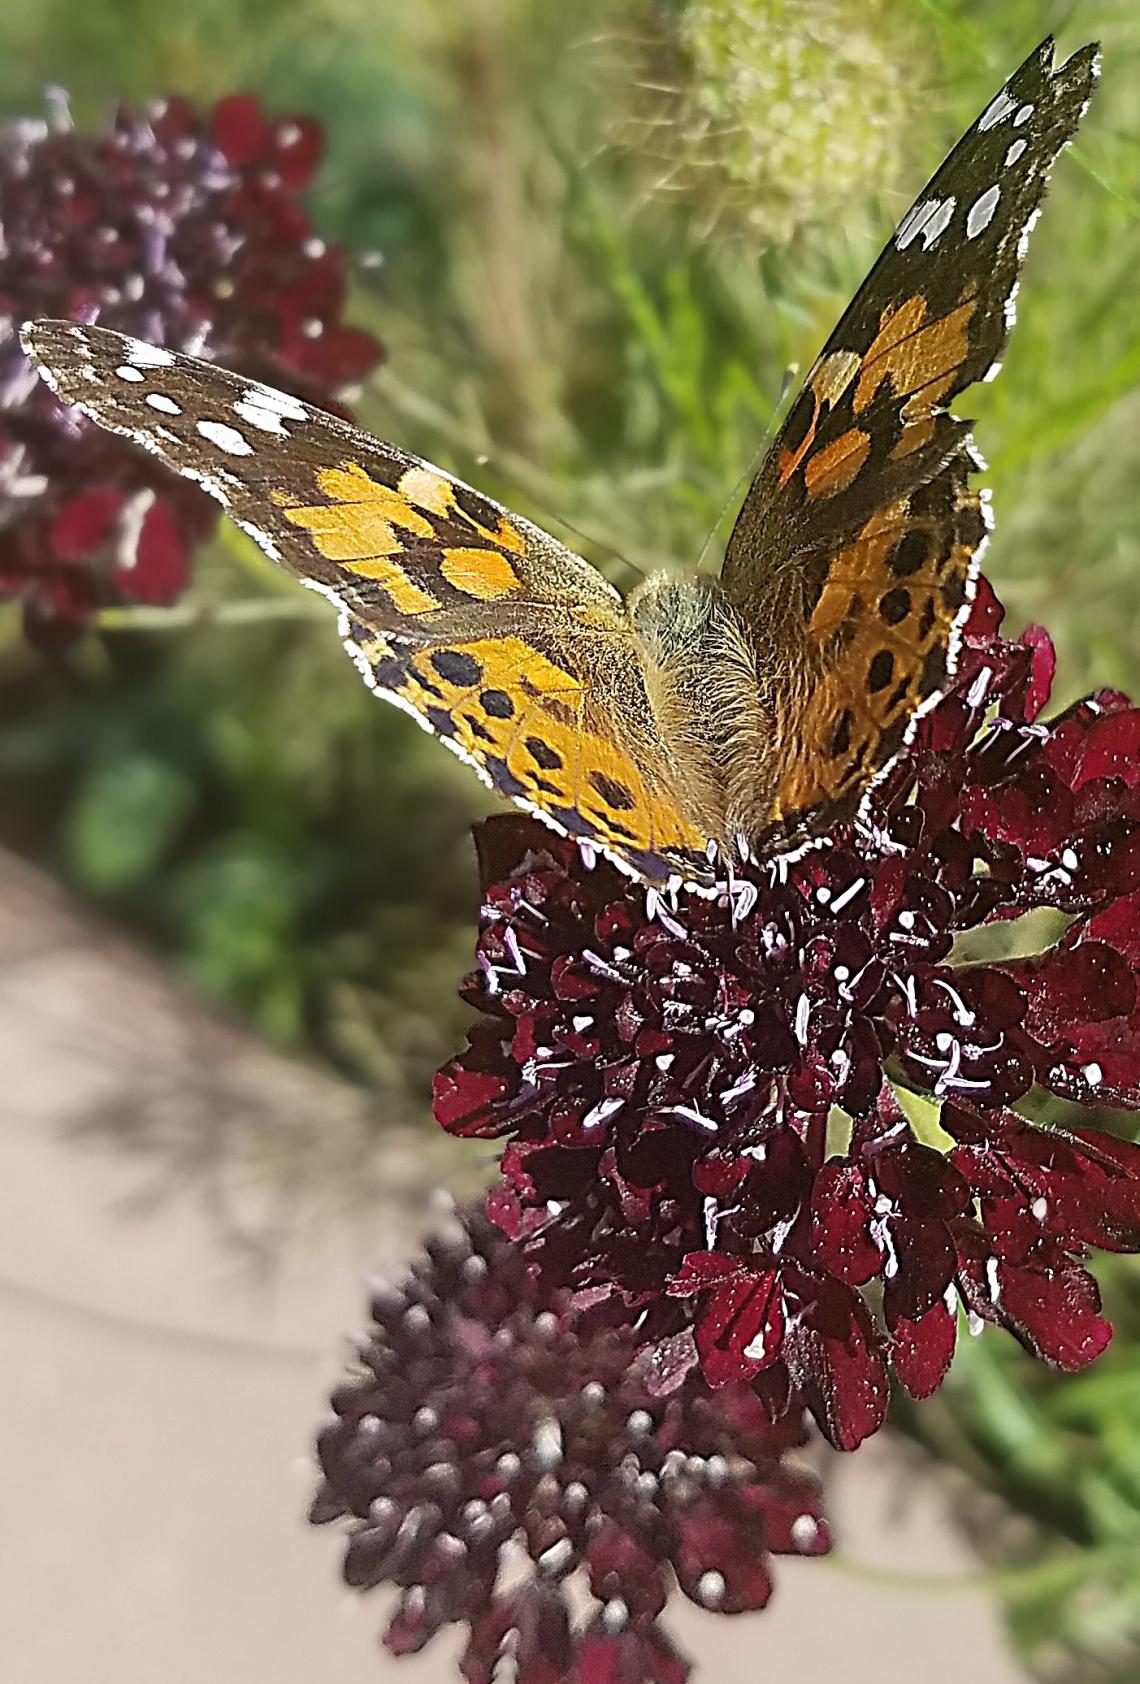 00-paintedlady-purplflower20170930_111621_pe